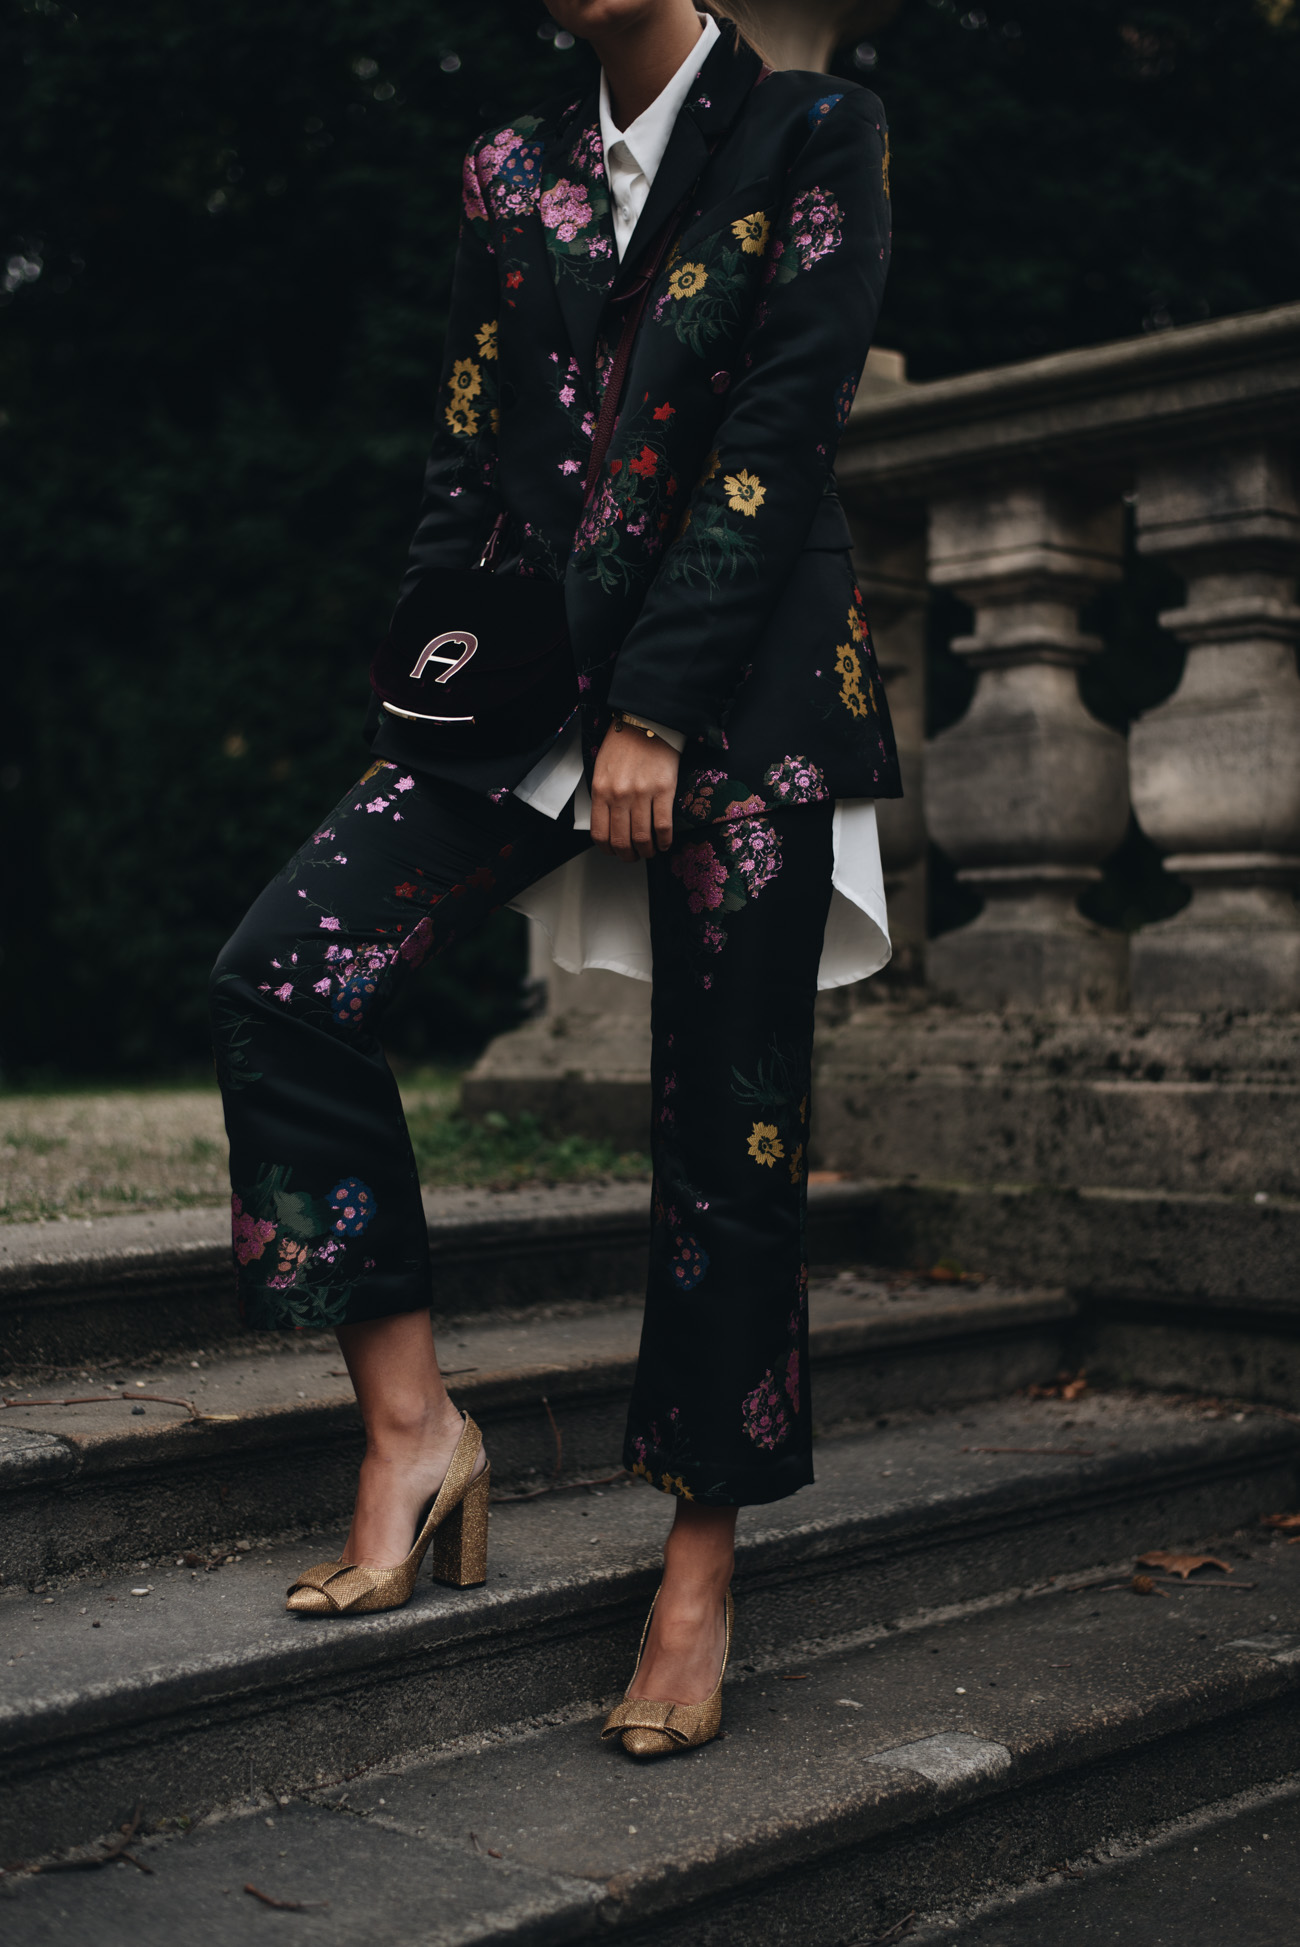 german-fashion-and-lifestyle-blogger-influencer-nina-schwichtenberg-fashiioncarpet-